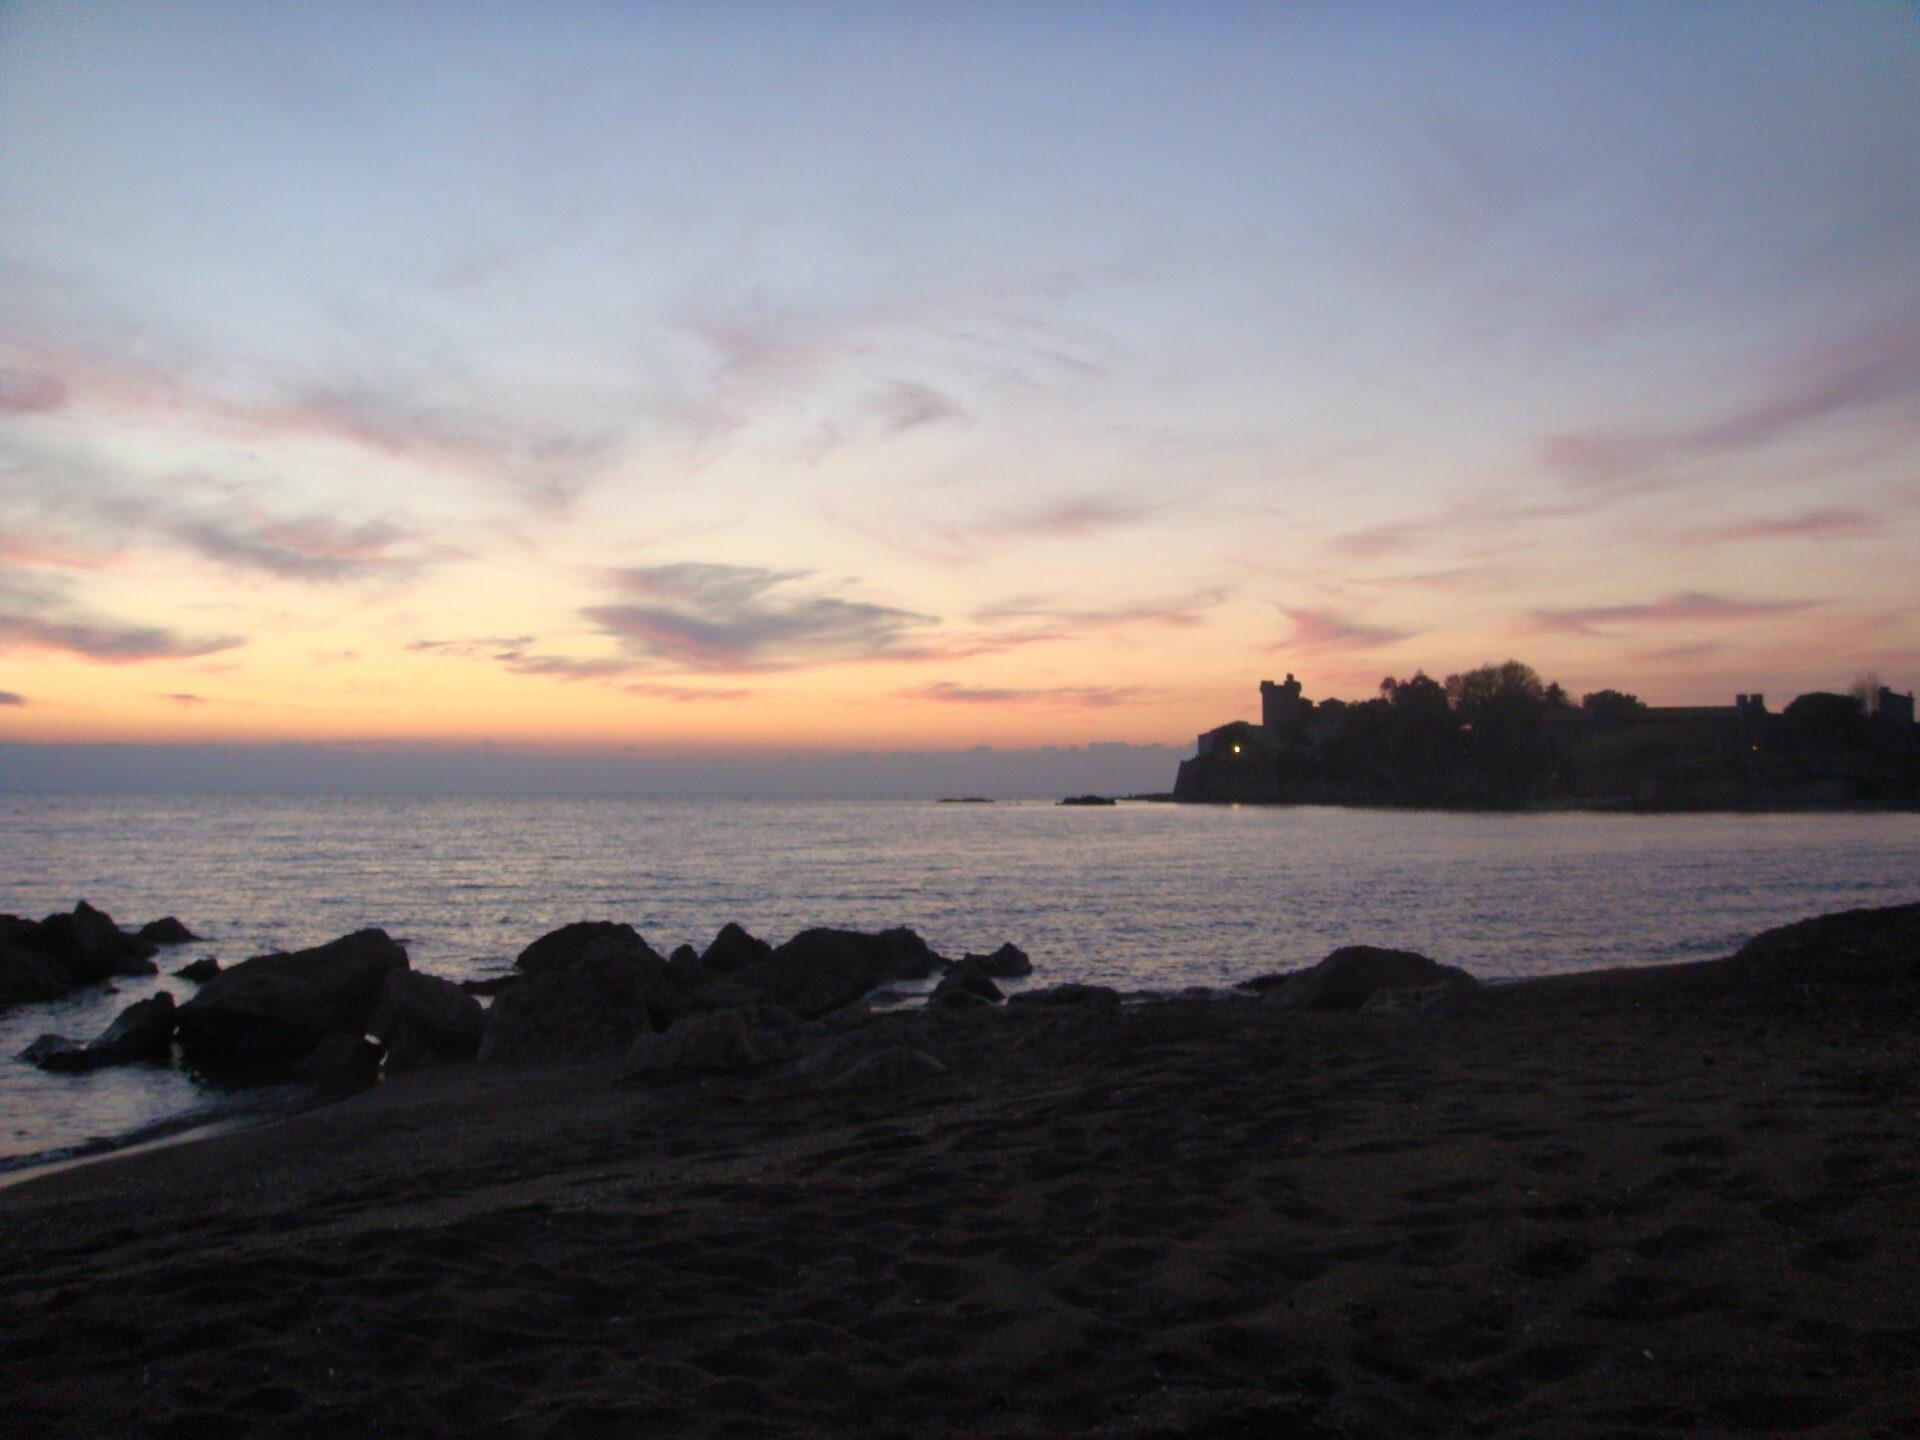 Surfcasting Lazio: Santa Severa